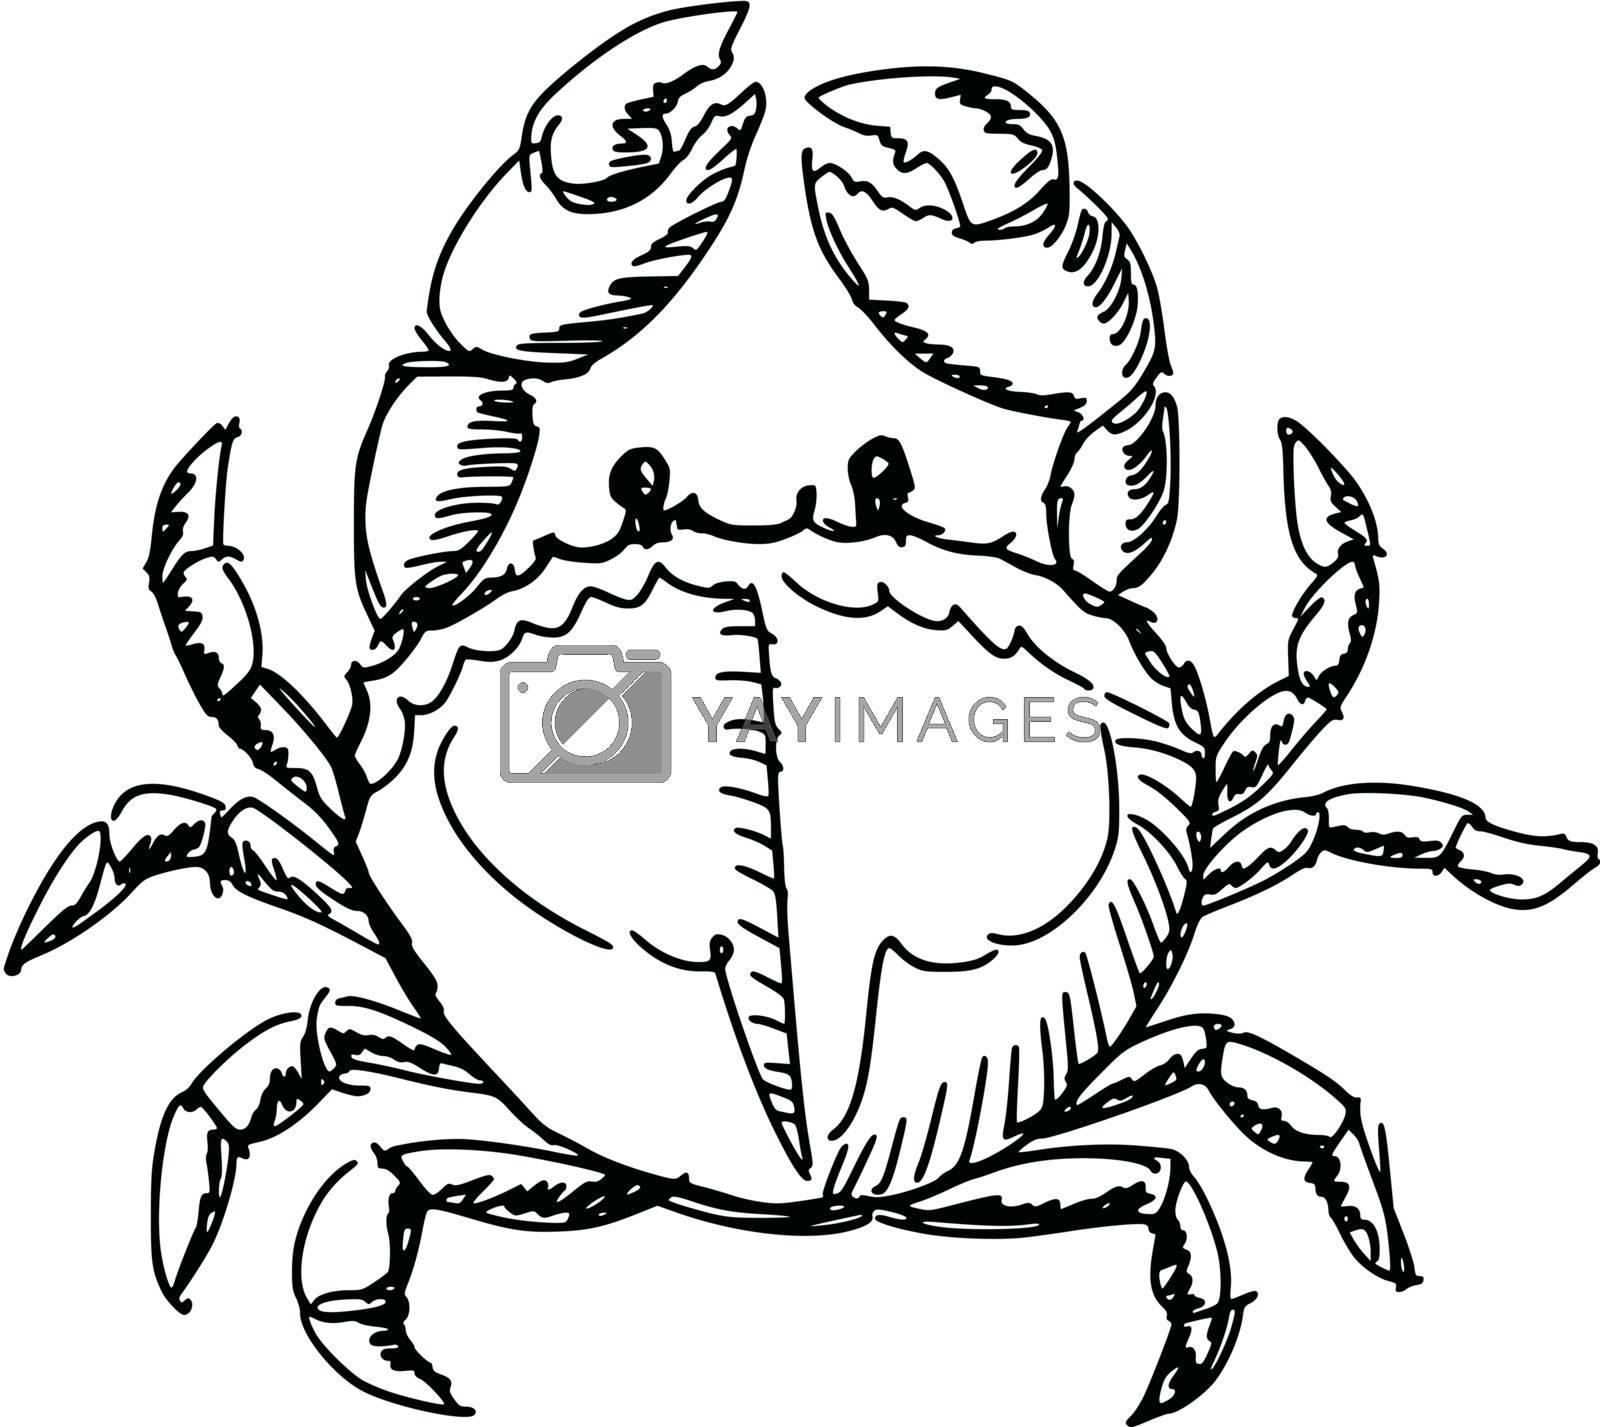 hand drawn, sketch, cartoon illustration of crab